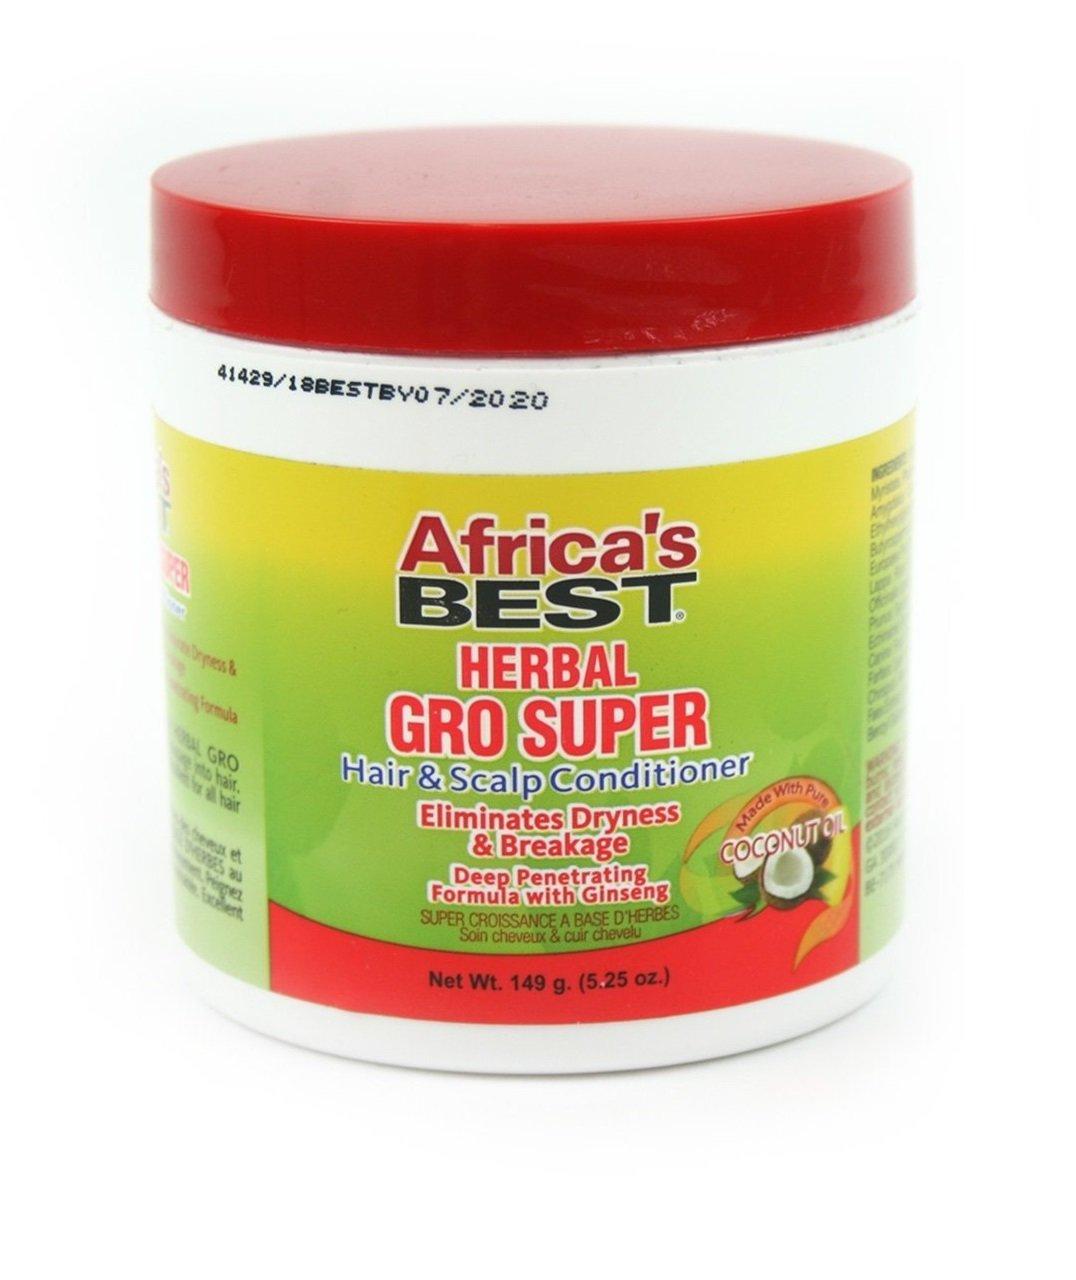 Africa's Best Herbal Gro Super 149g